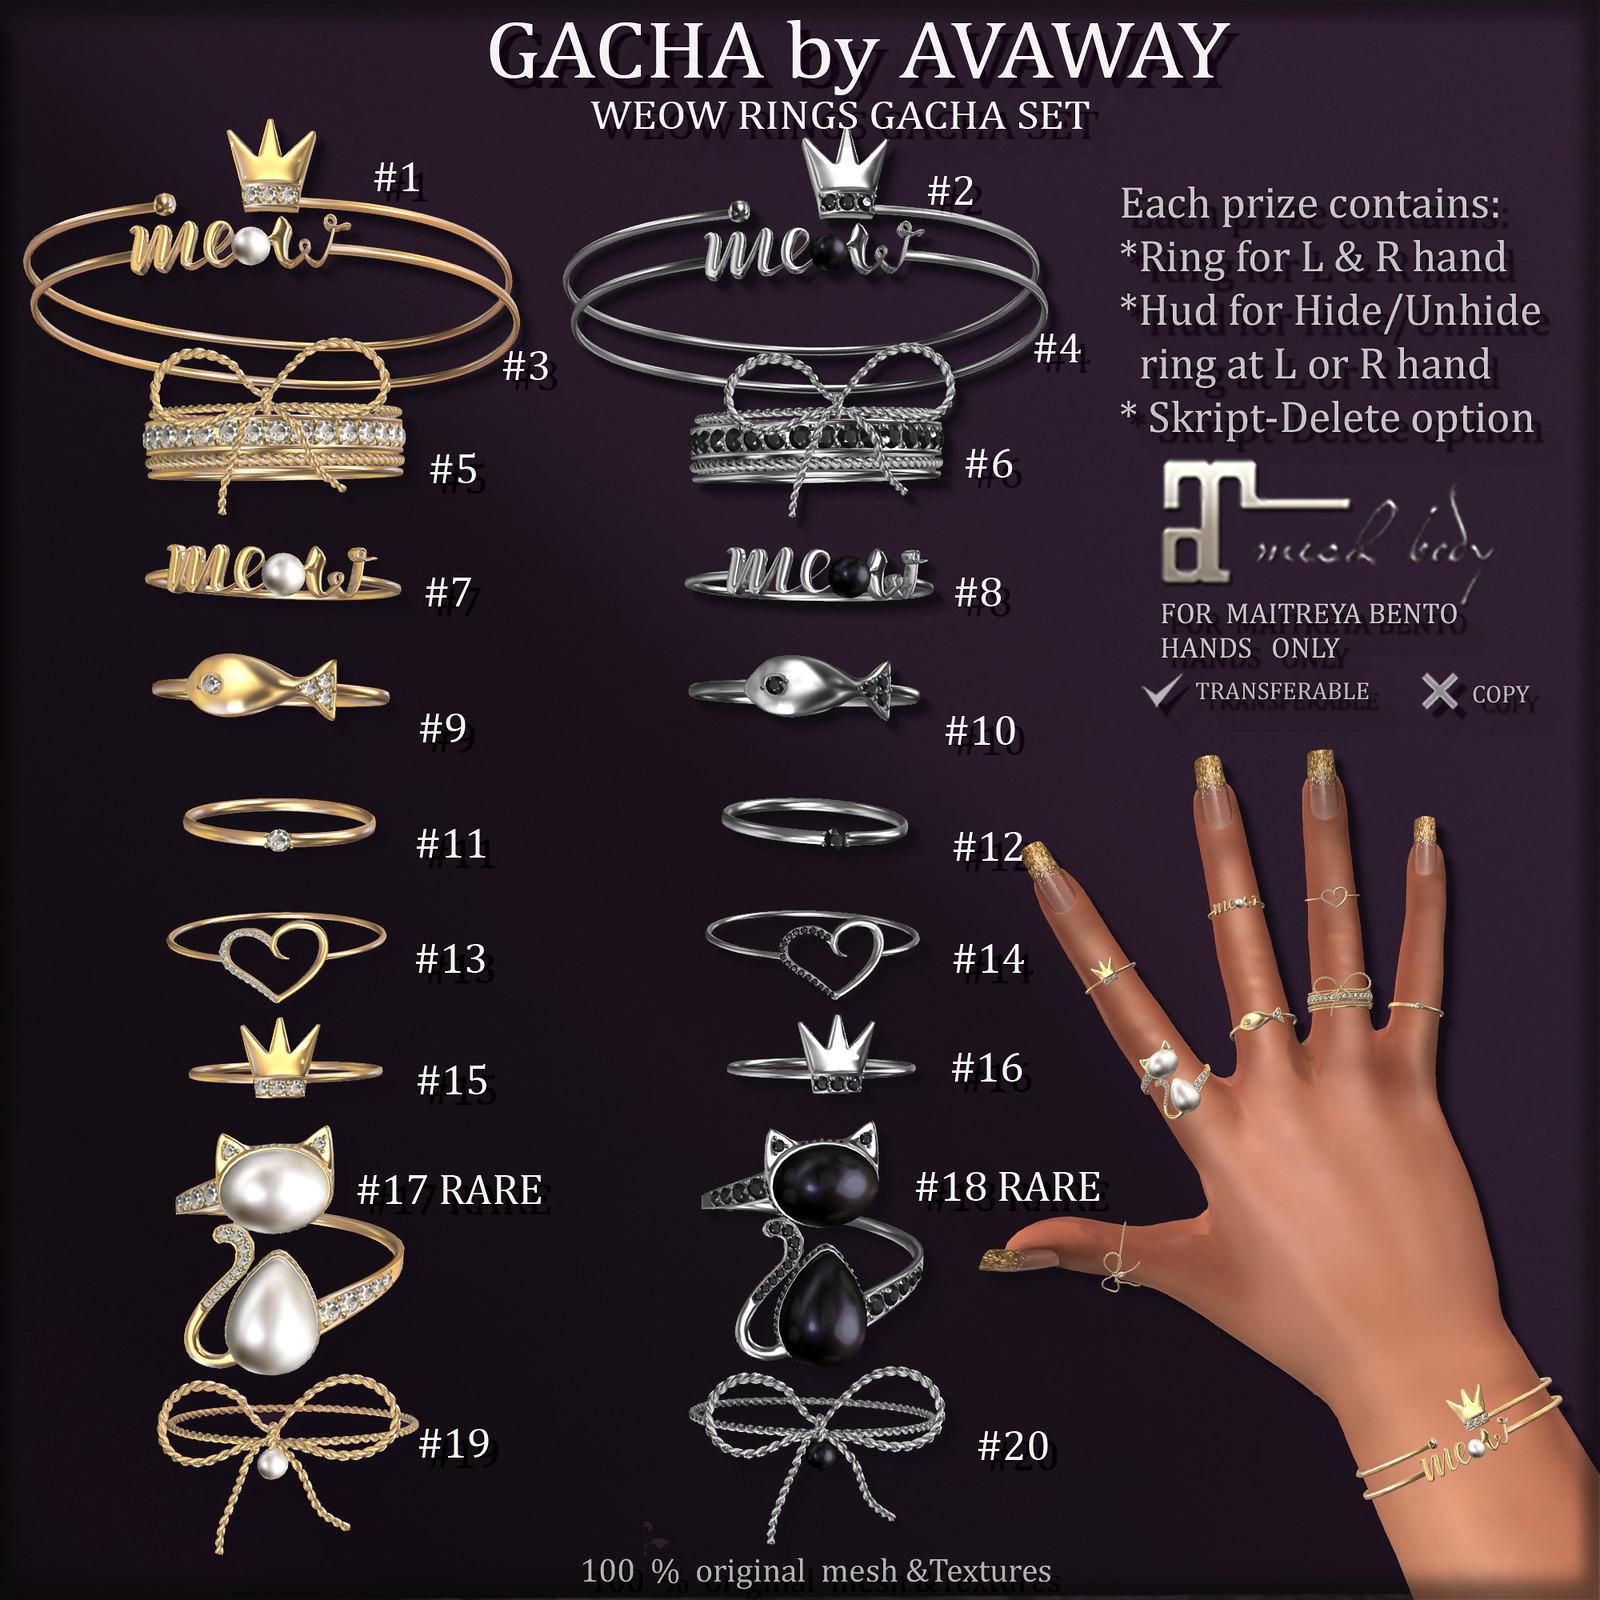 MEOW RINGS GACHA SET